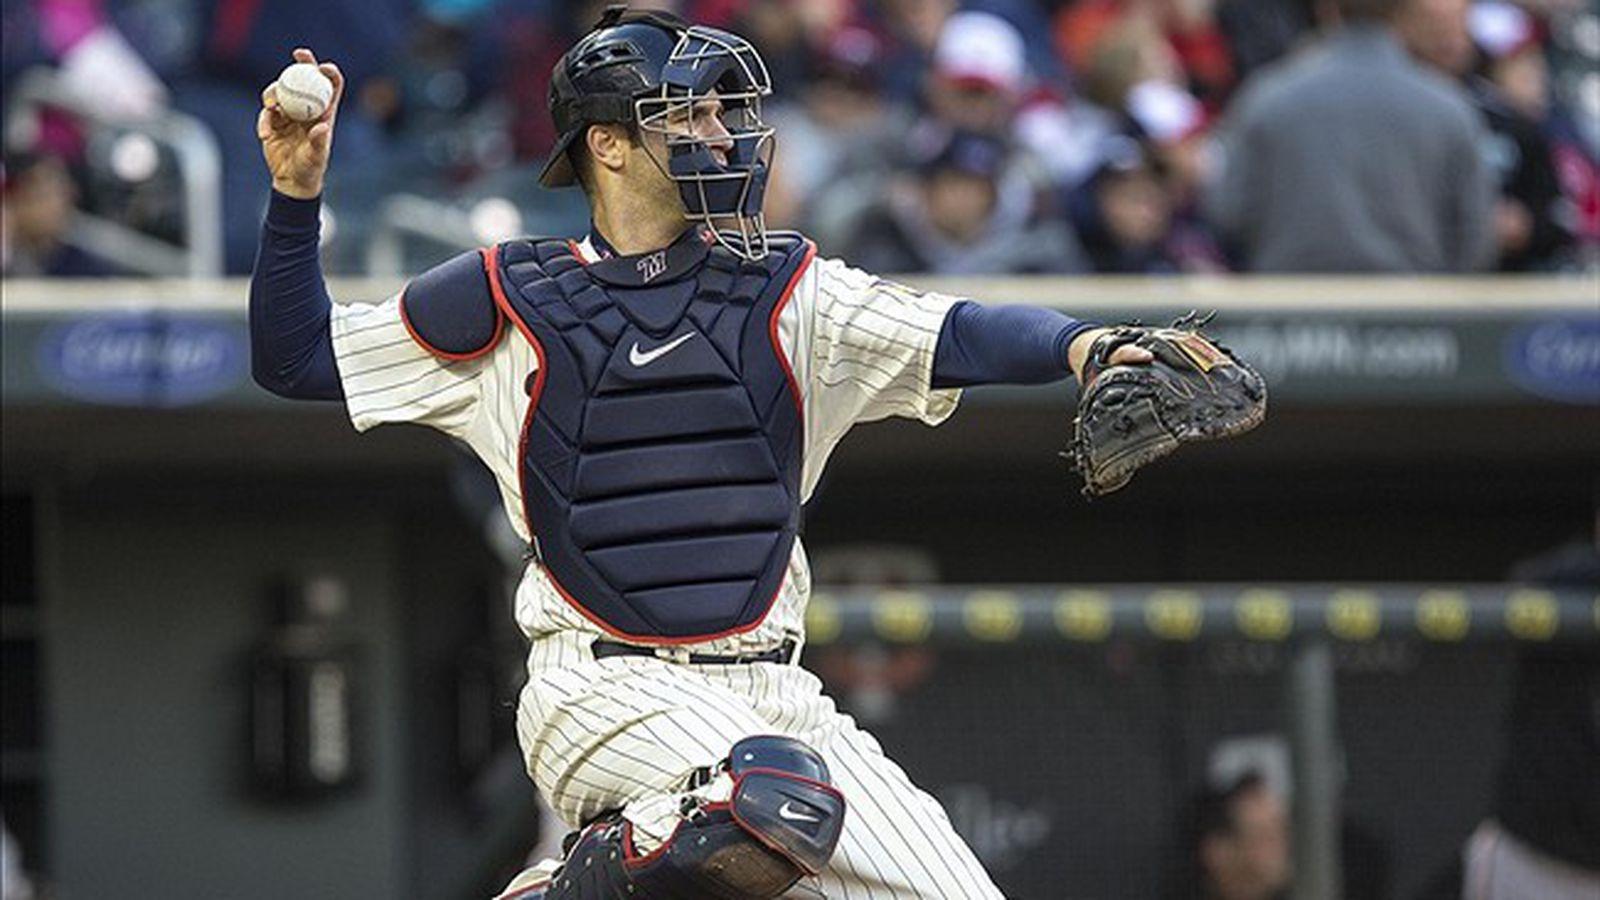 The risk behind a high school catcher